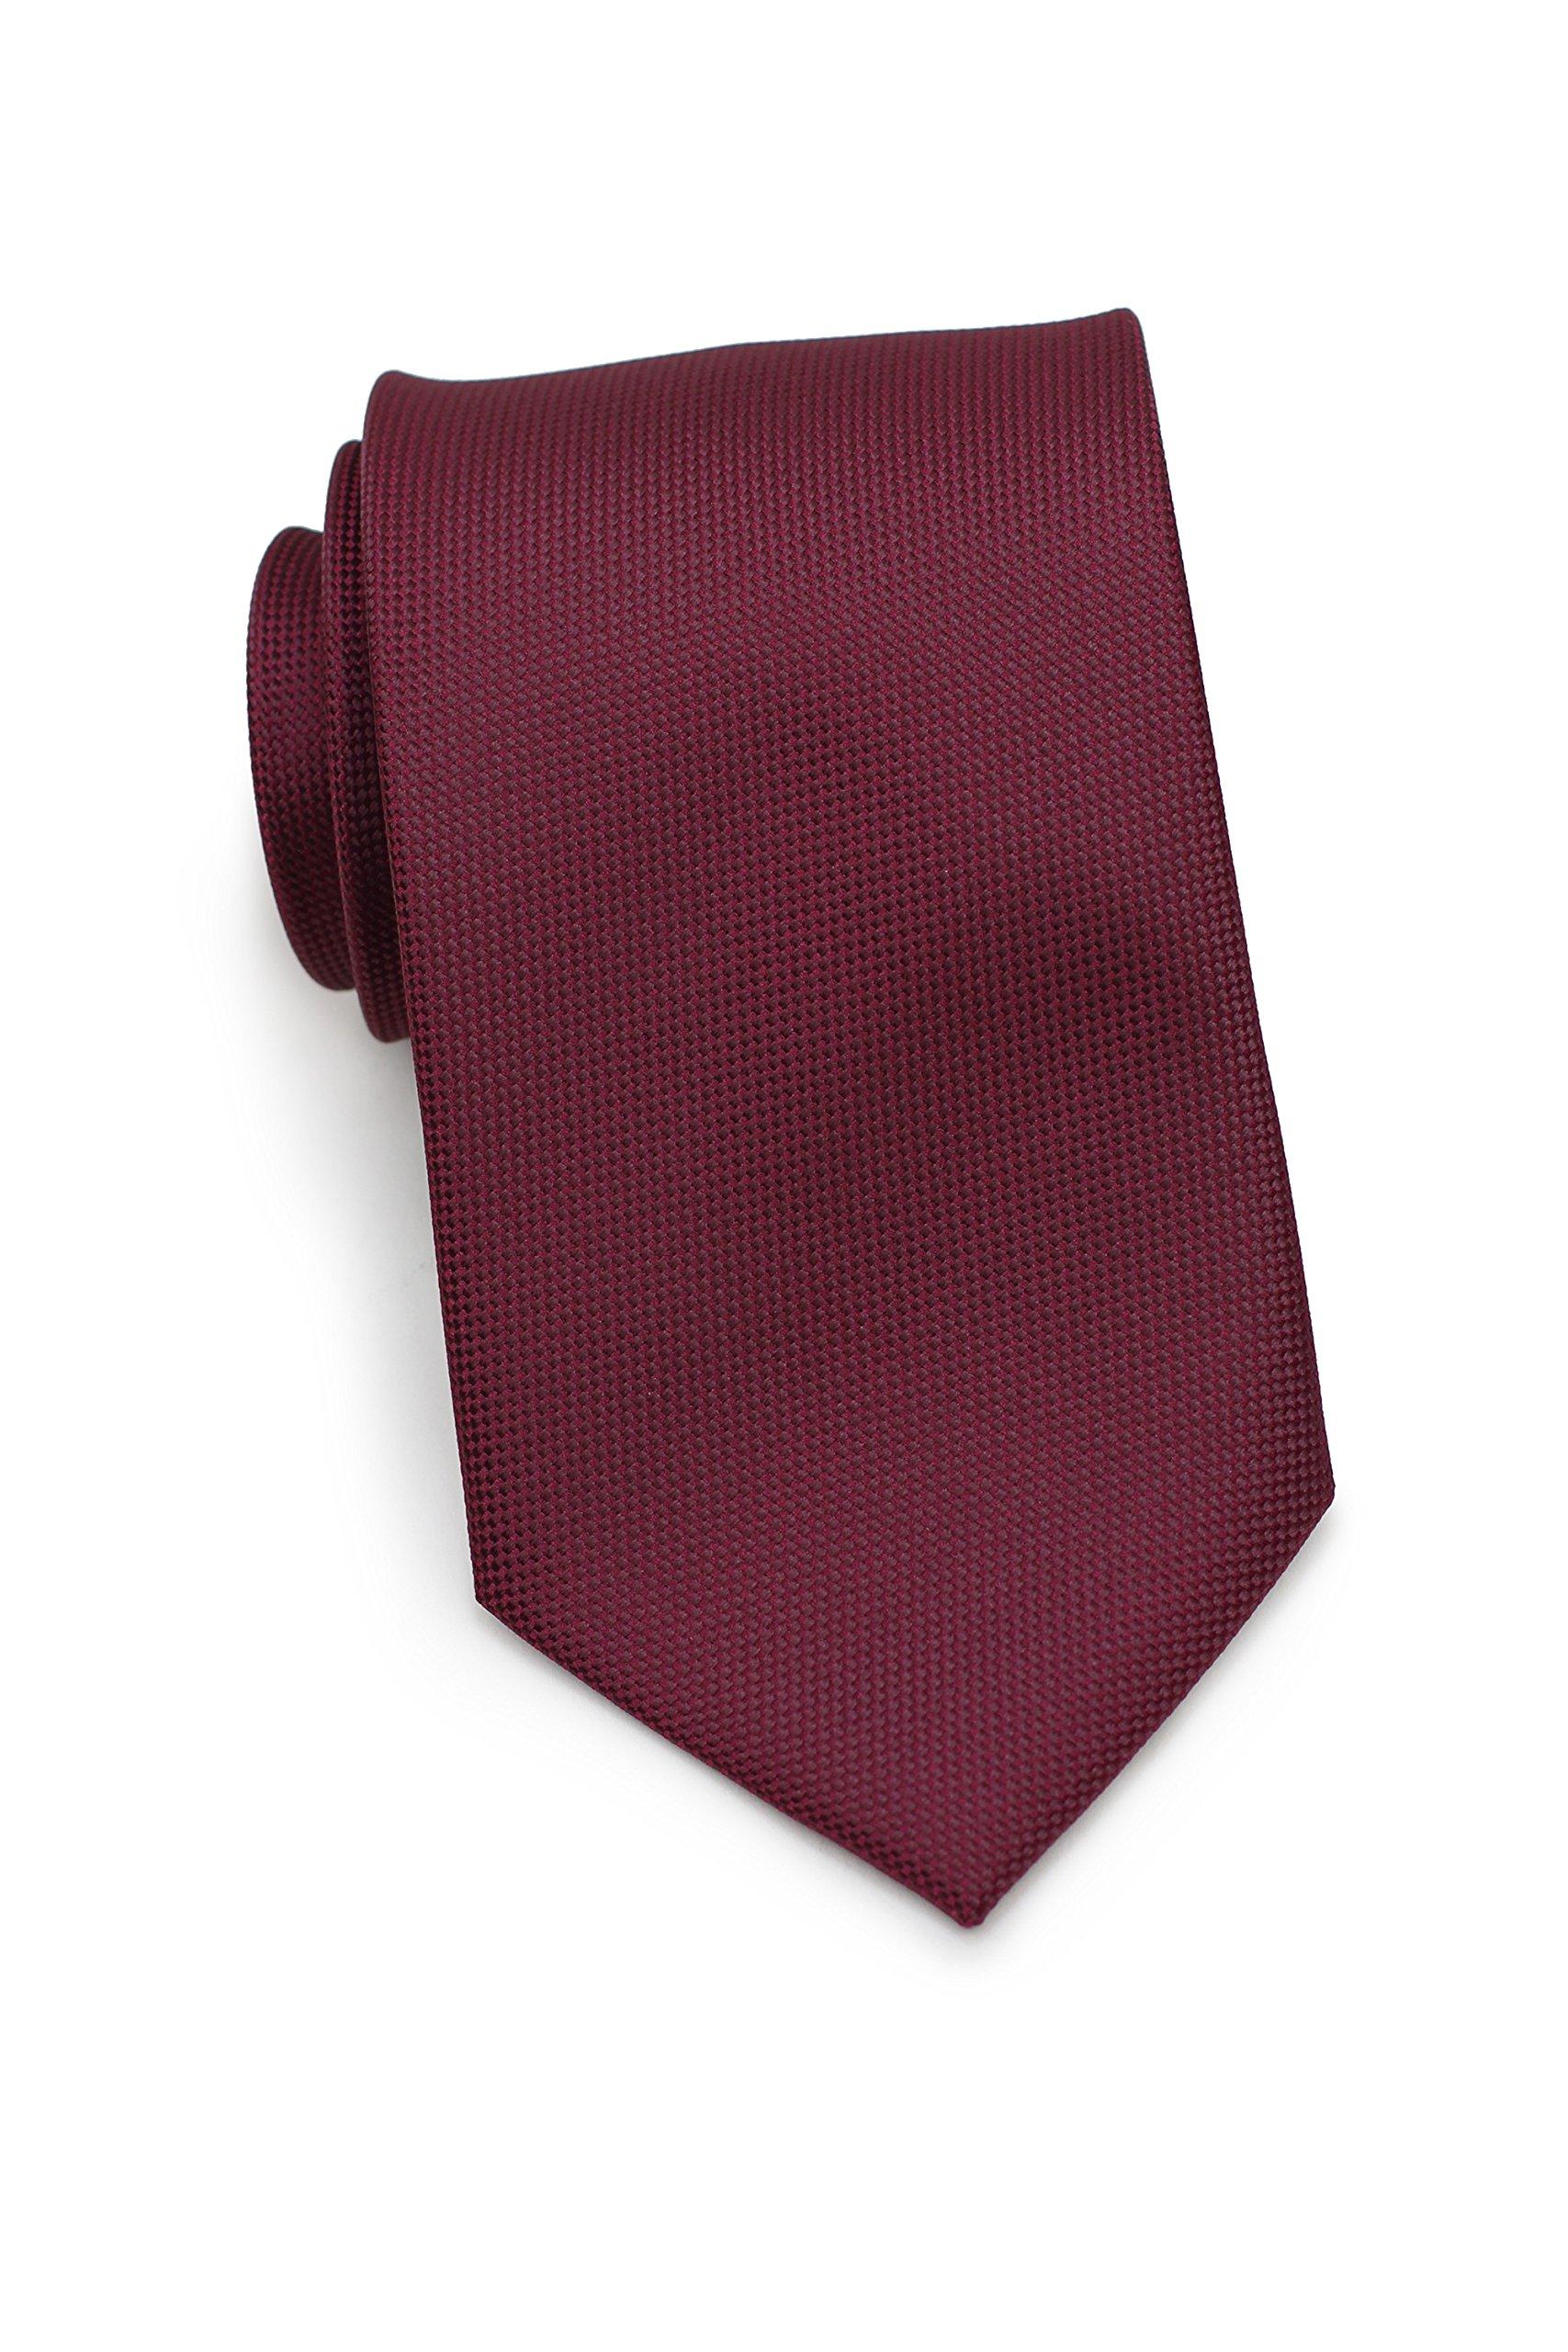 Bows-N-Ties Men's Necktie Solid Textured Microfiber Matte Tie 3.25 Inches (Maroon)